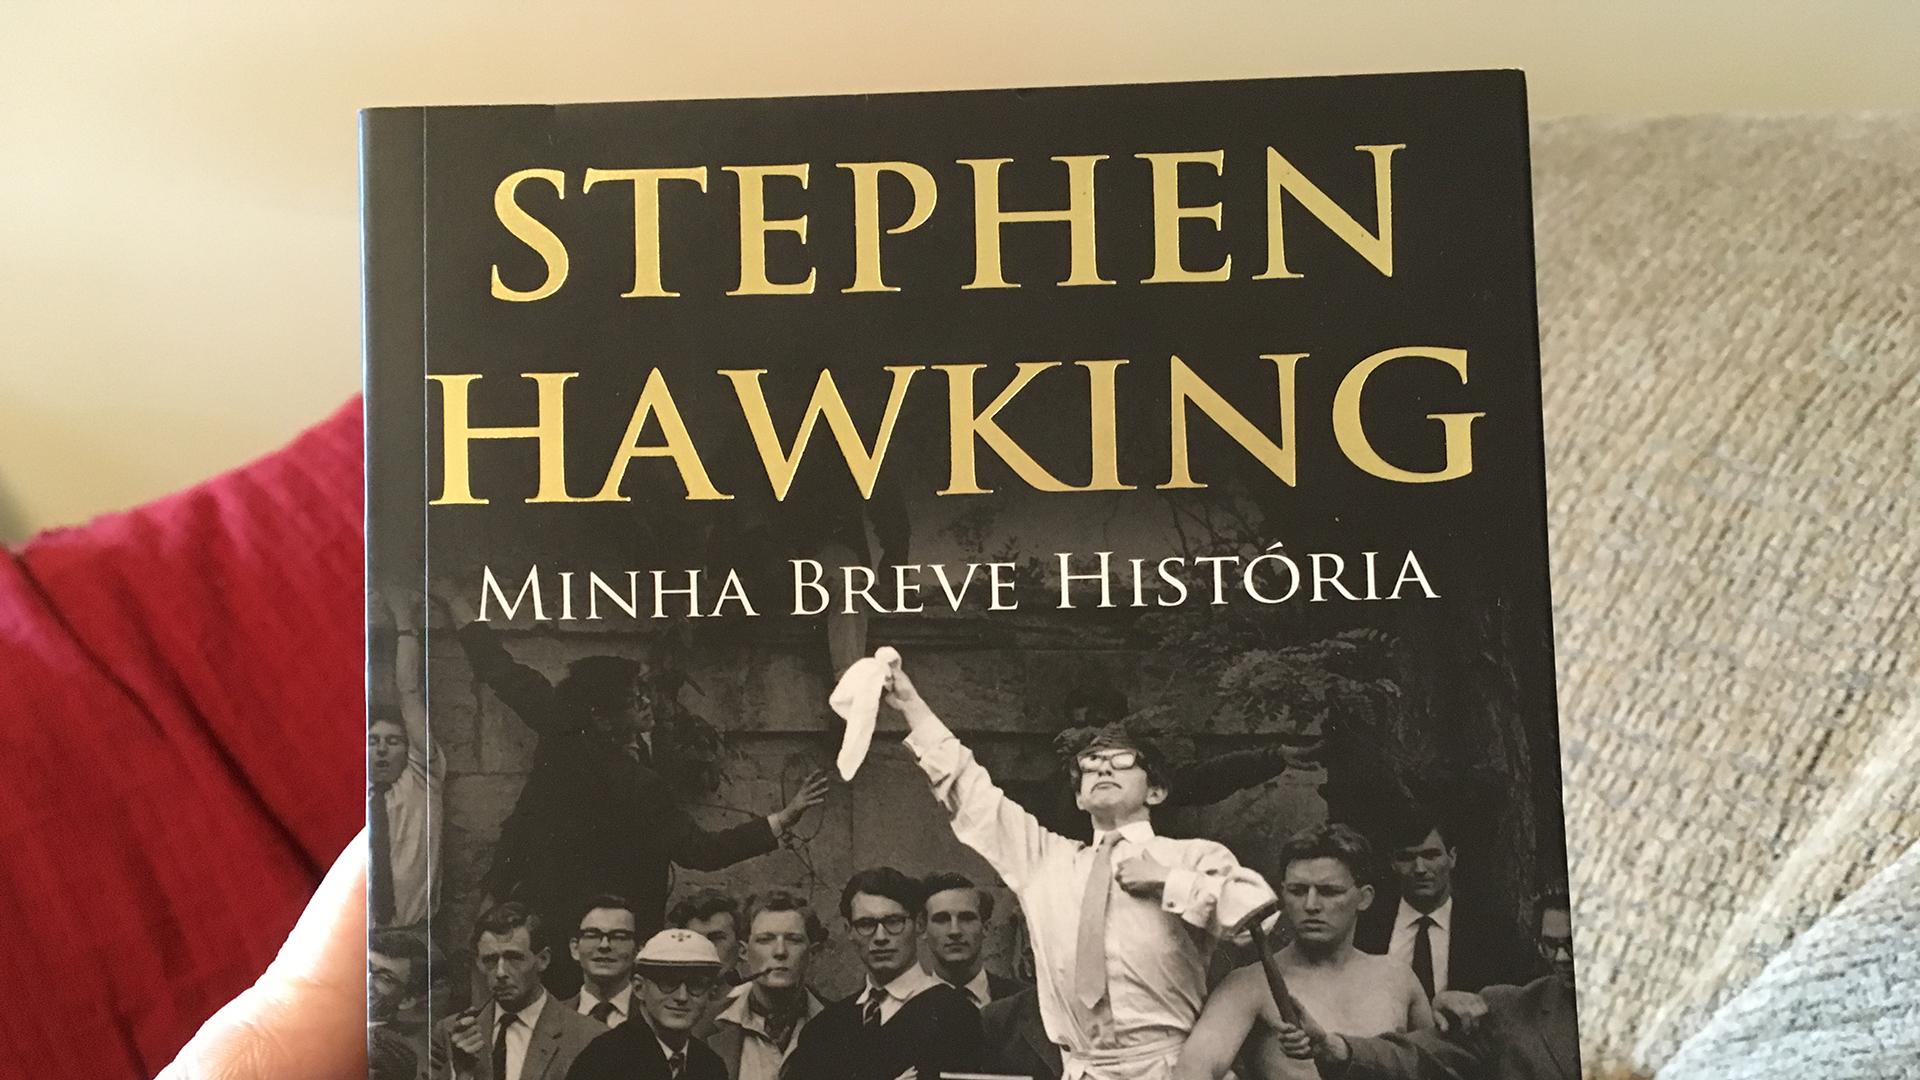 Minha breve história – Stephen Hawking (resenha)